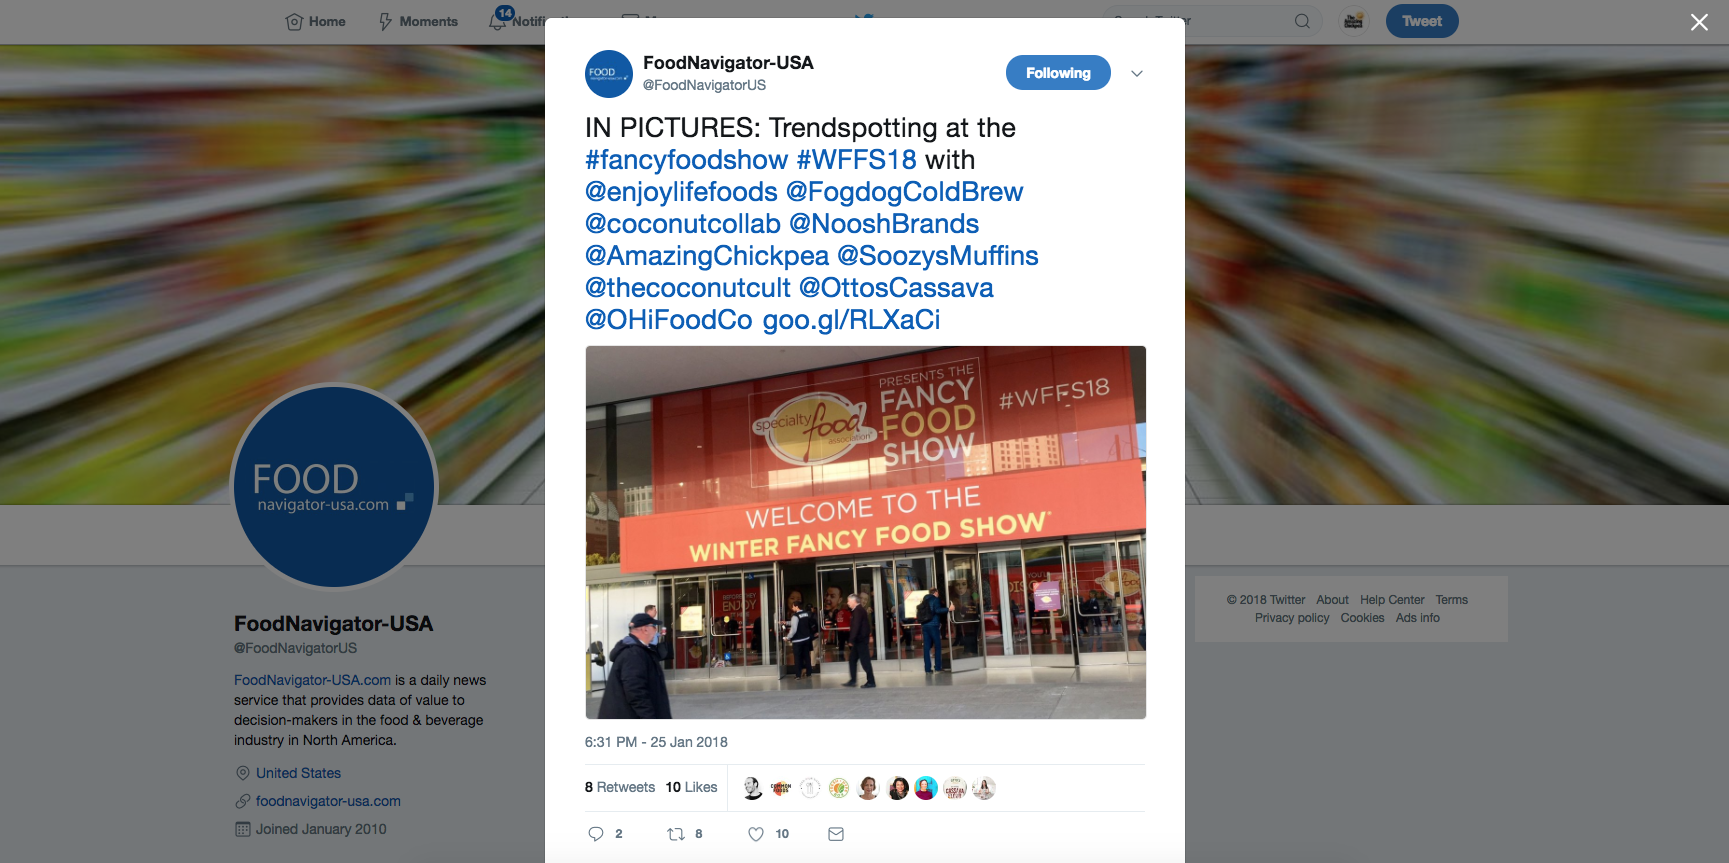 Trending at the Fancy Food Show – via FoodNavigator